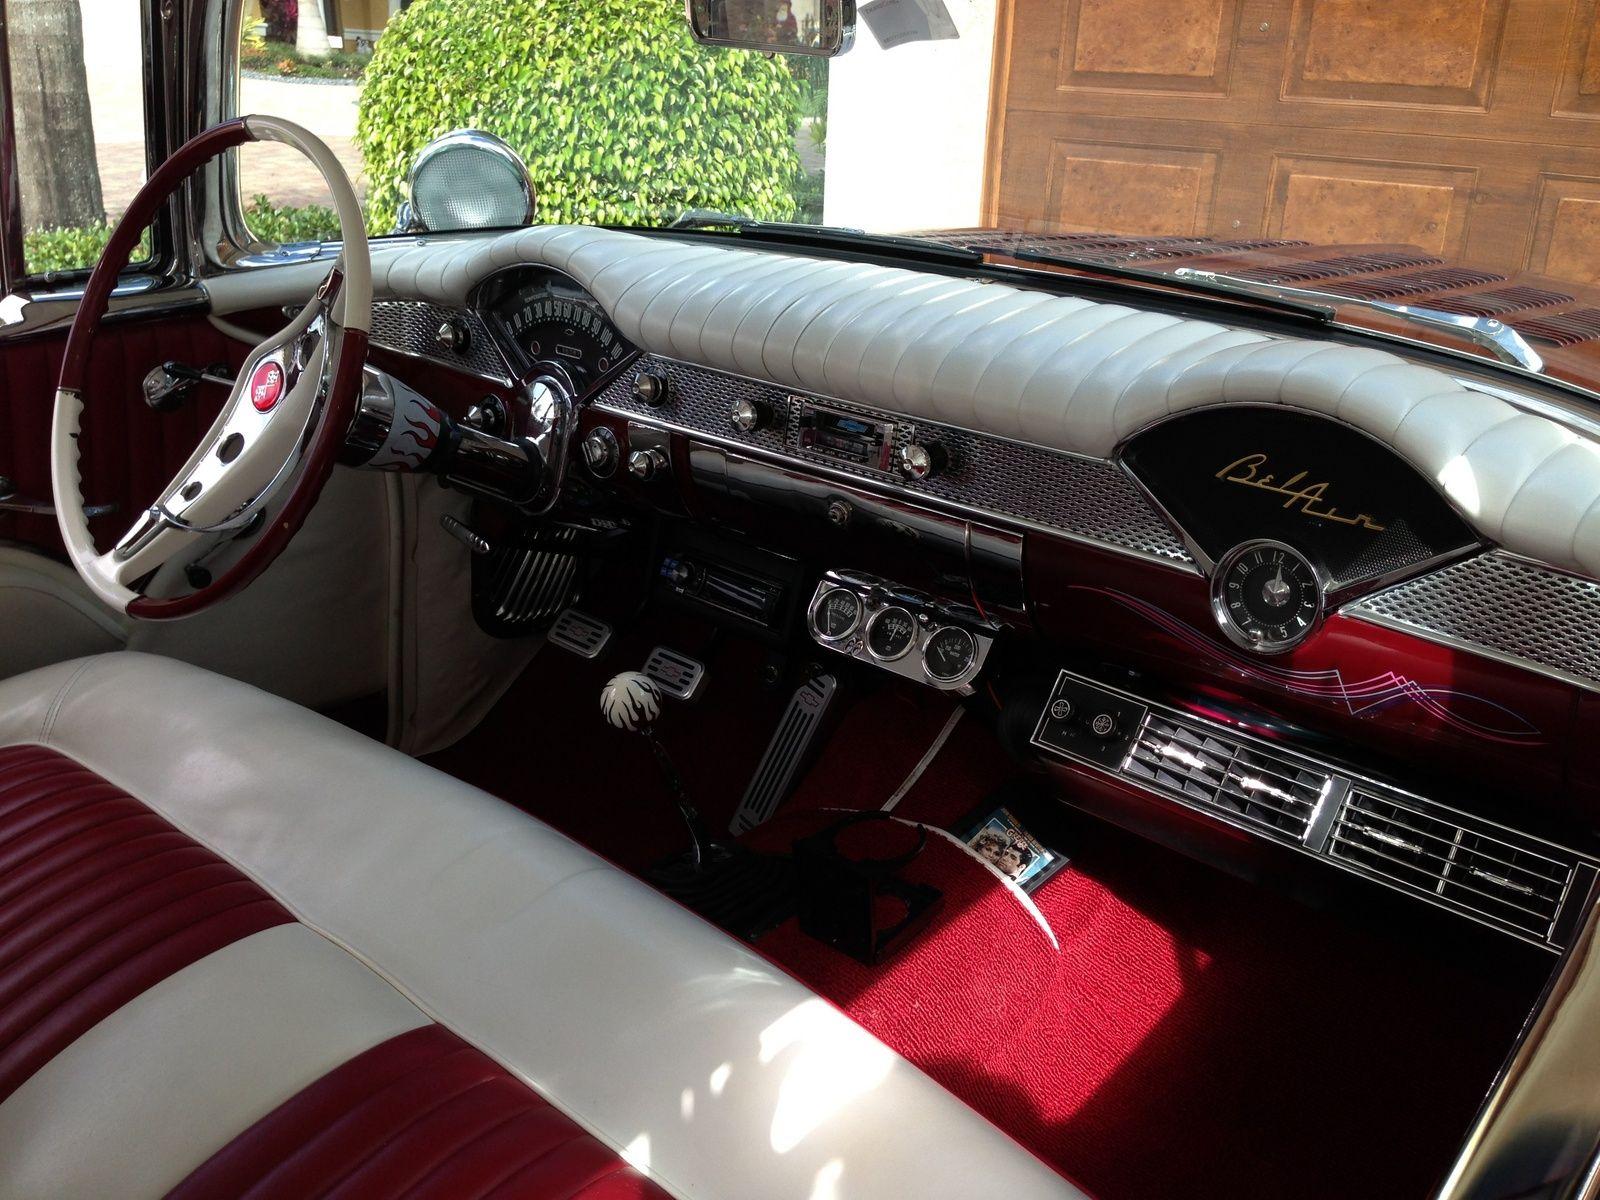 1956 chevrolet belair mjc classic cars pristine - 1955 Chevrolet Bel Air Base